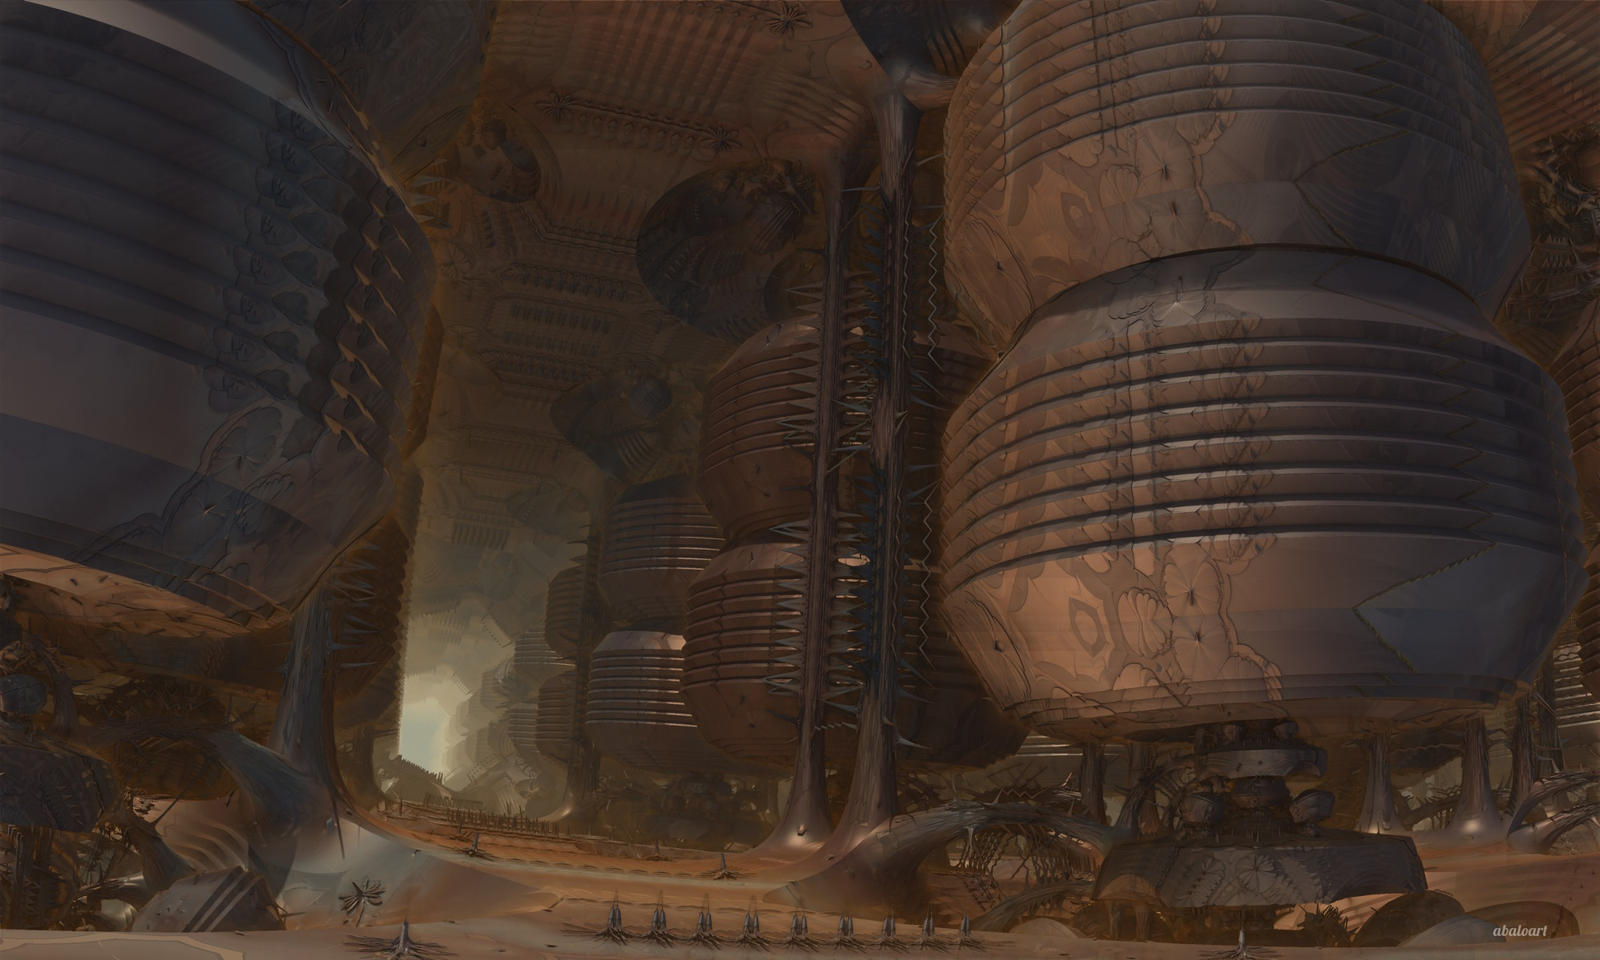 Power Plant by batjorge